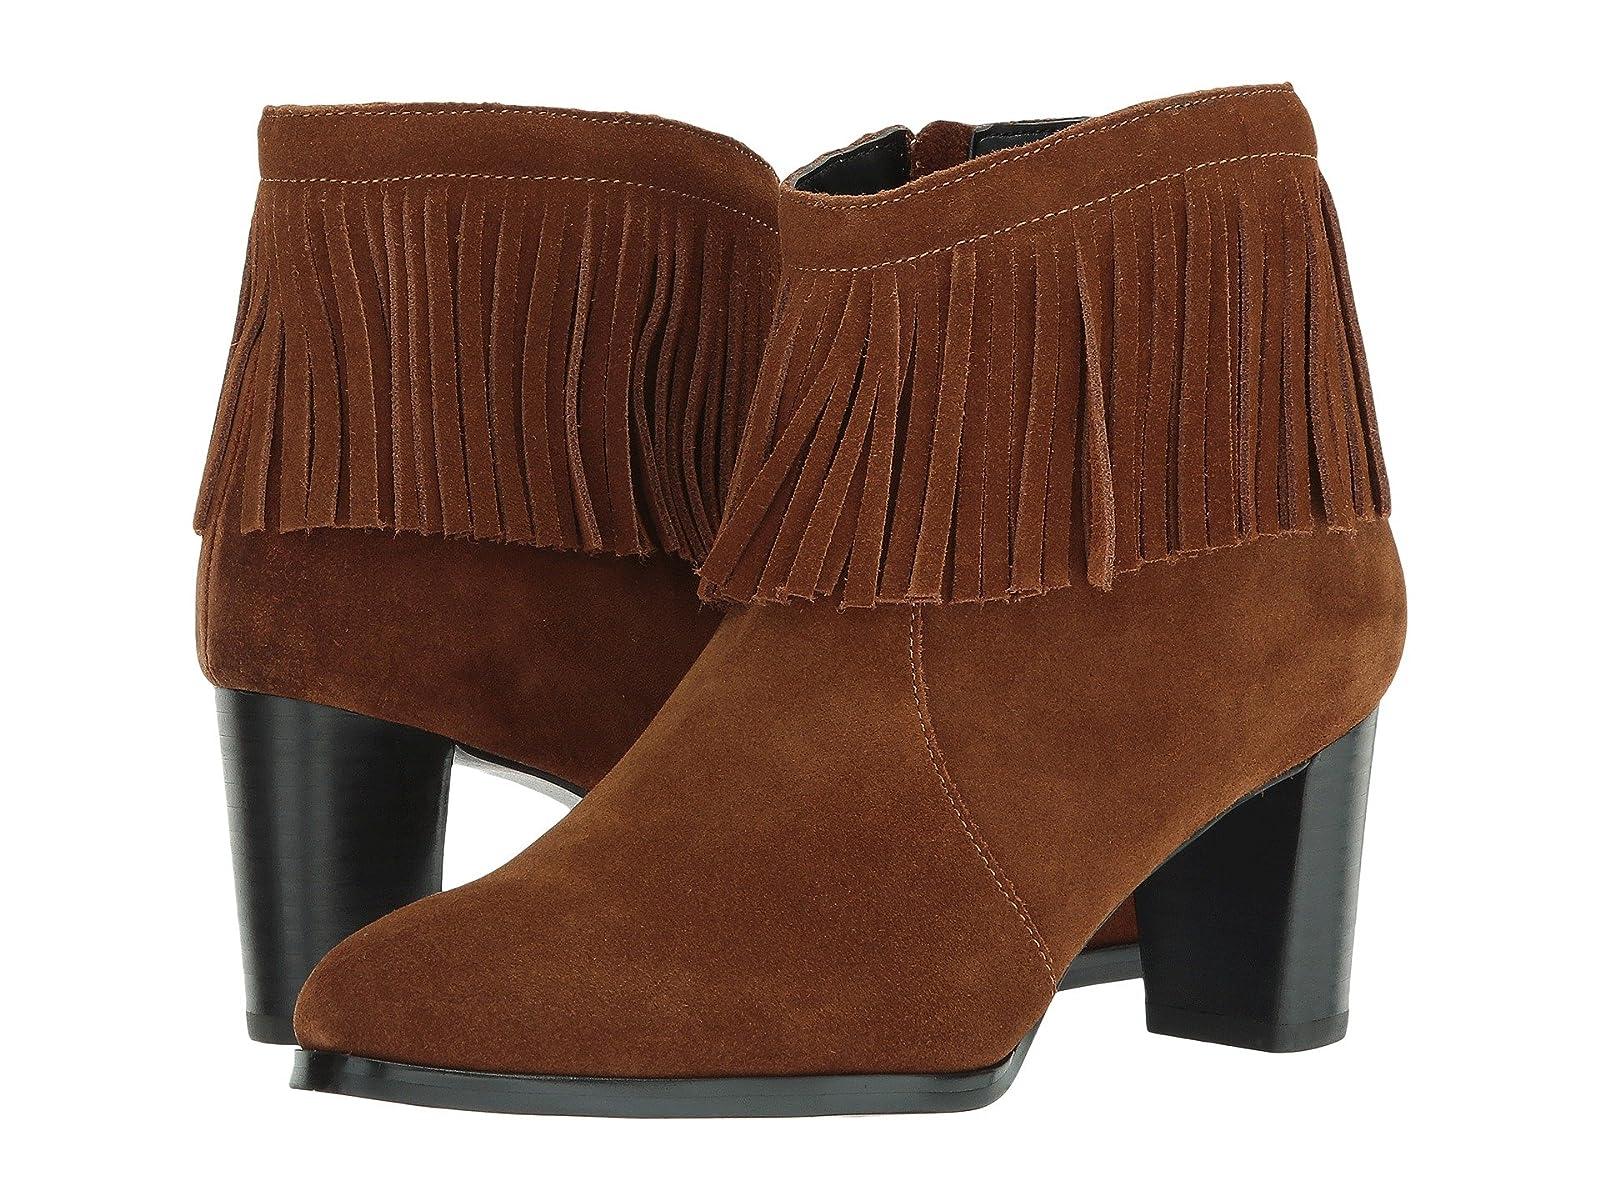 David Tate MistyCheap and distinctive eye-catching shoes